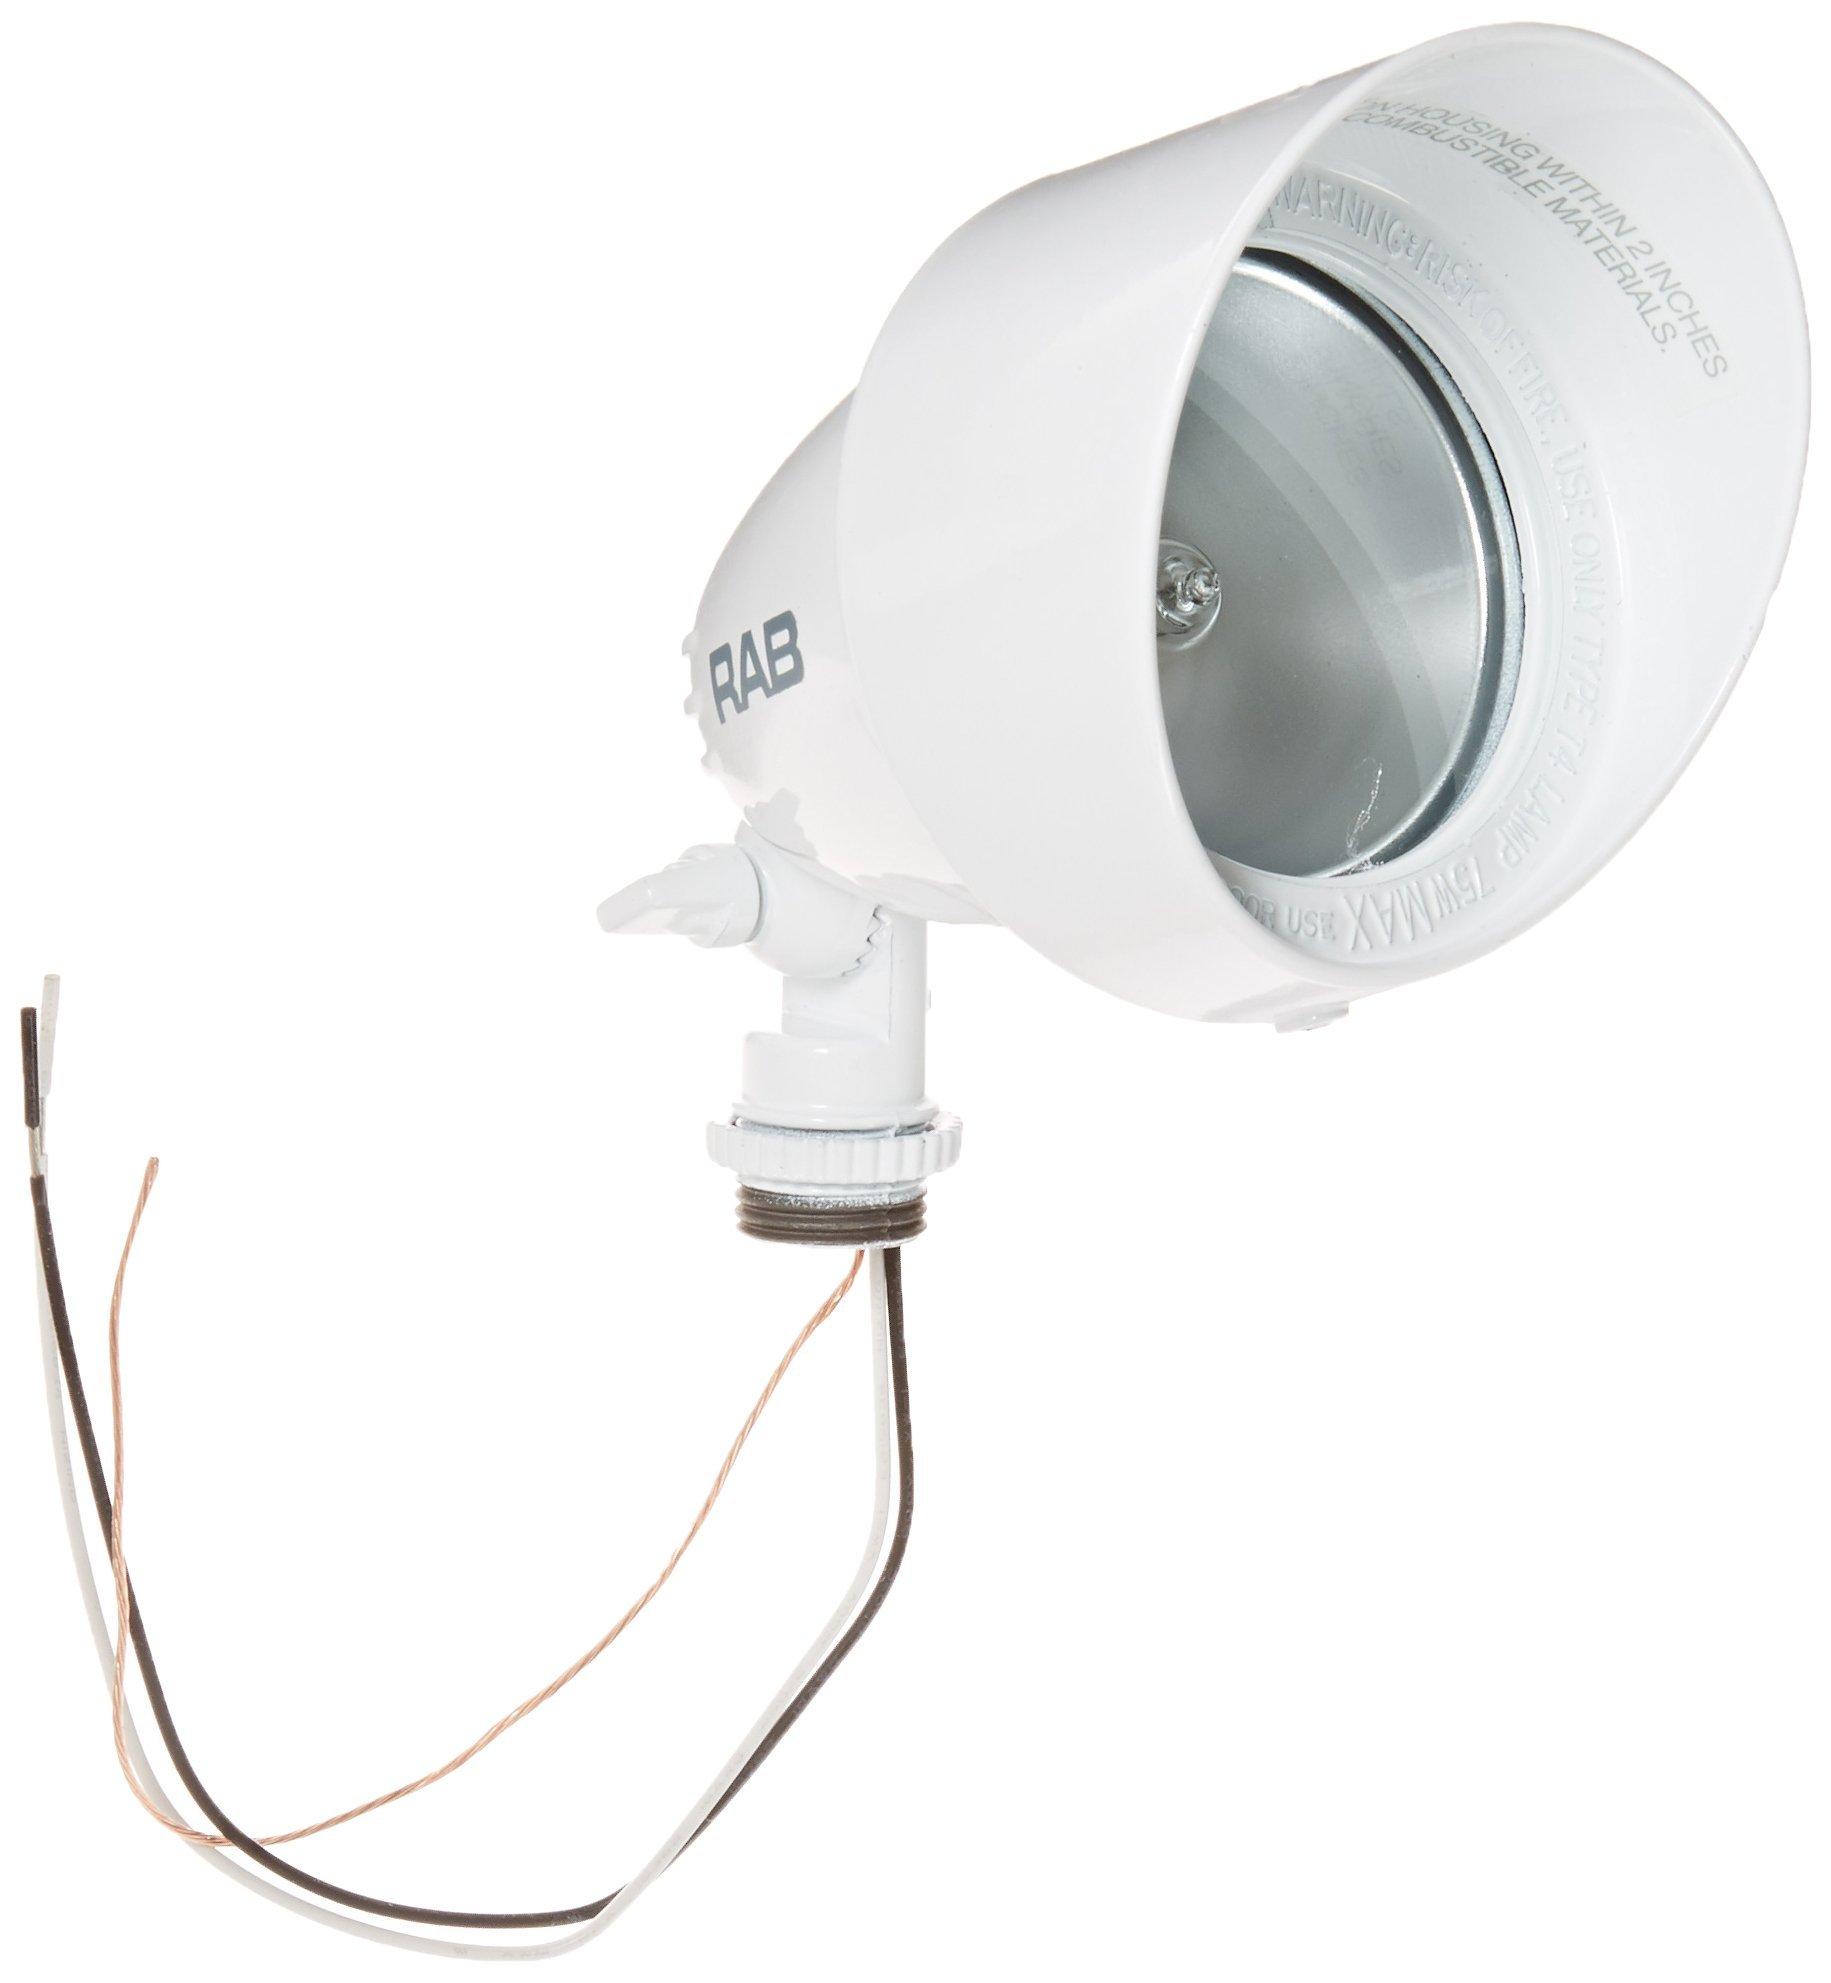 RAB Lighting QB1W Quartz Bullet Floodlight, Aluminum, 75W Power, 1500 Lumens, 127V, White